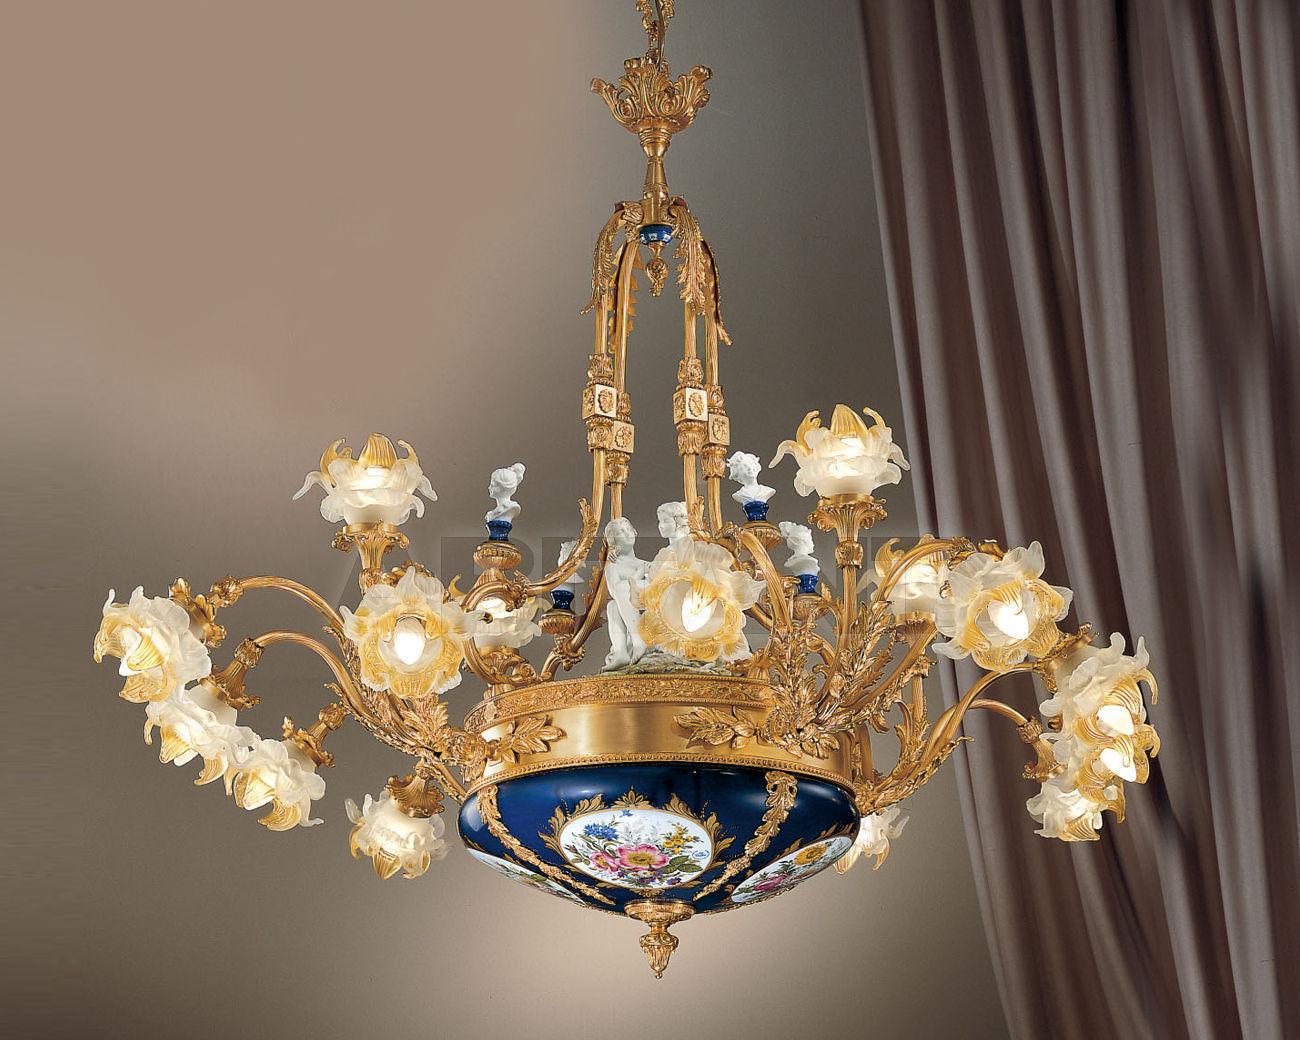 Купить Люстра F.B.A.I. Candeliere 4301/16